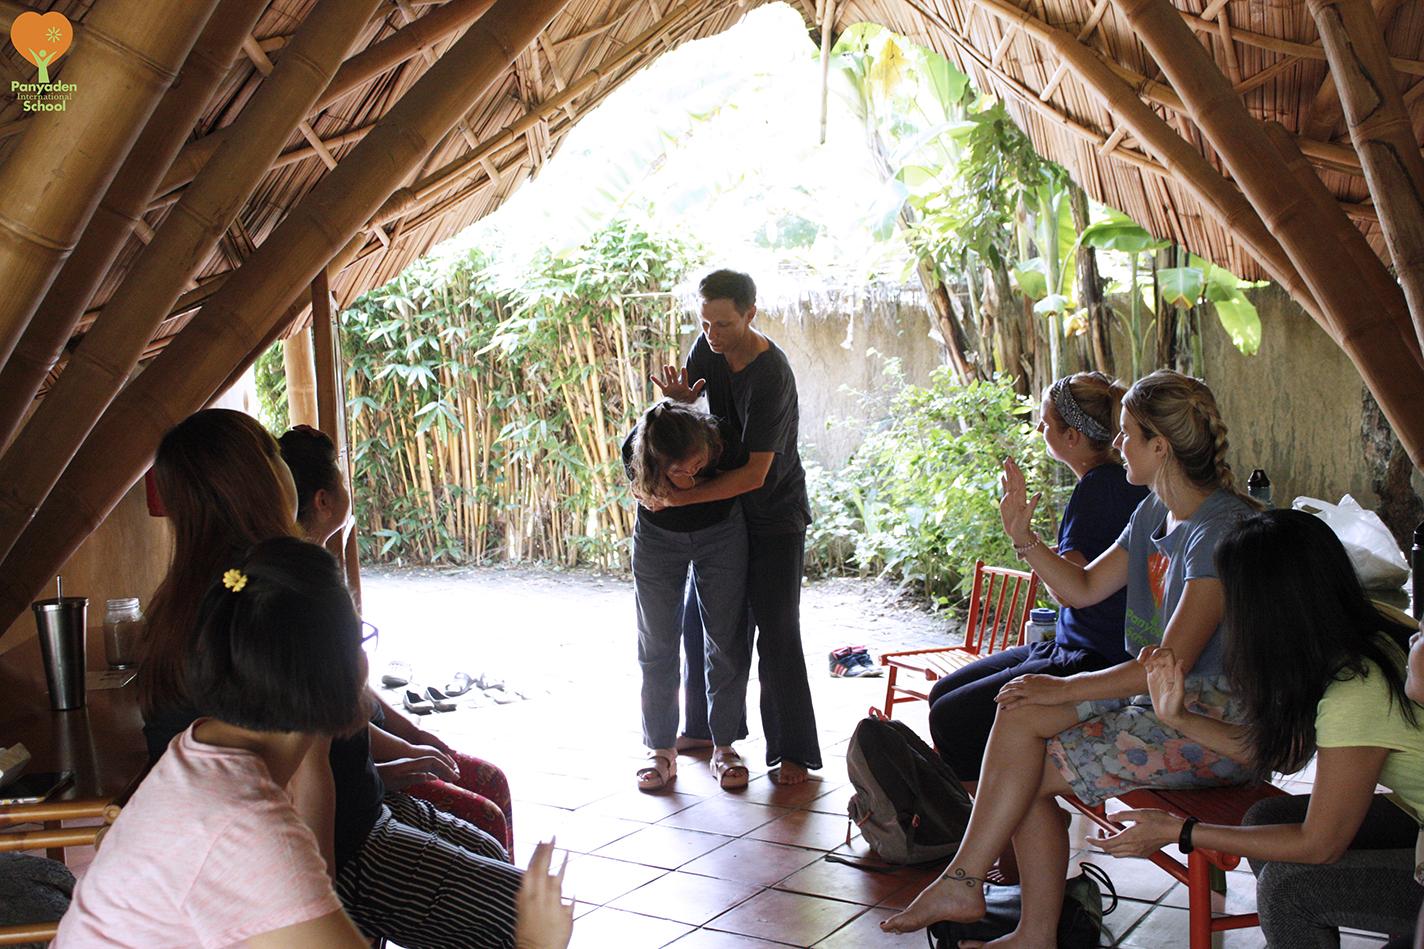 Teacher Training at Panyaden - dealing with a choking victim, basic first aid